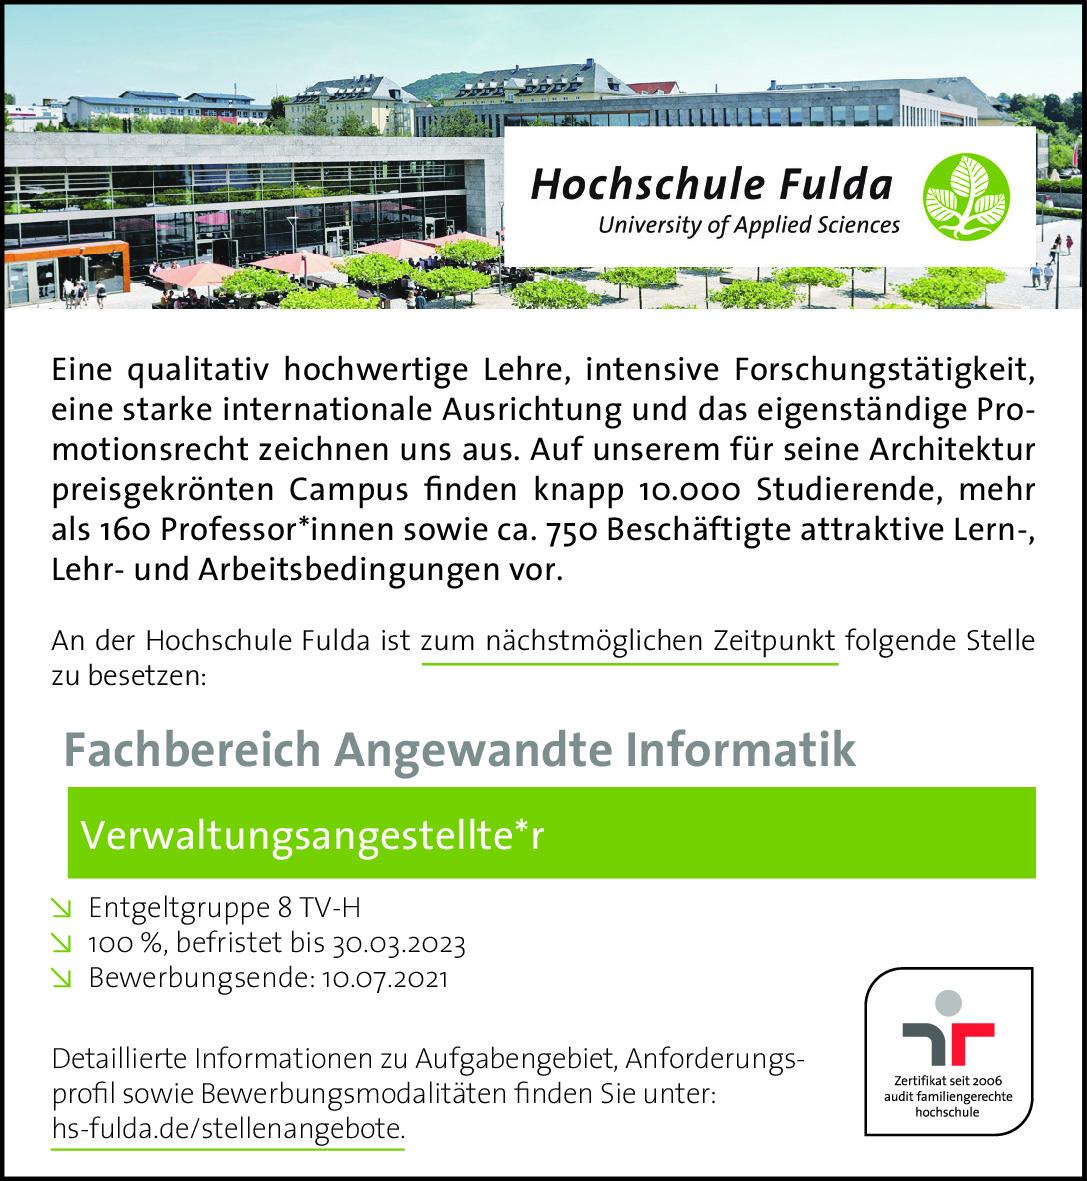 Auftragsnummer: 099390175AA Hochschule Fulda